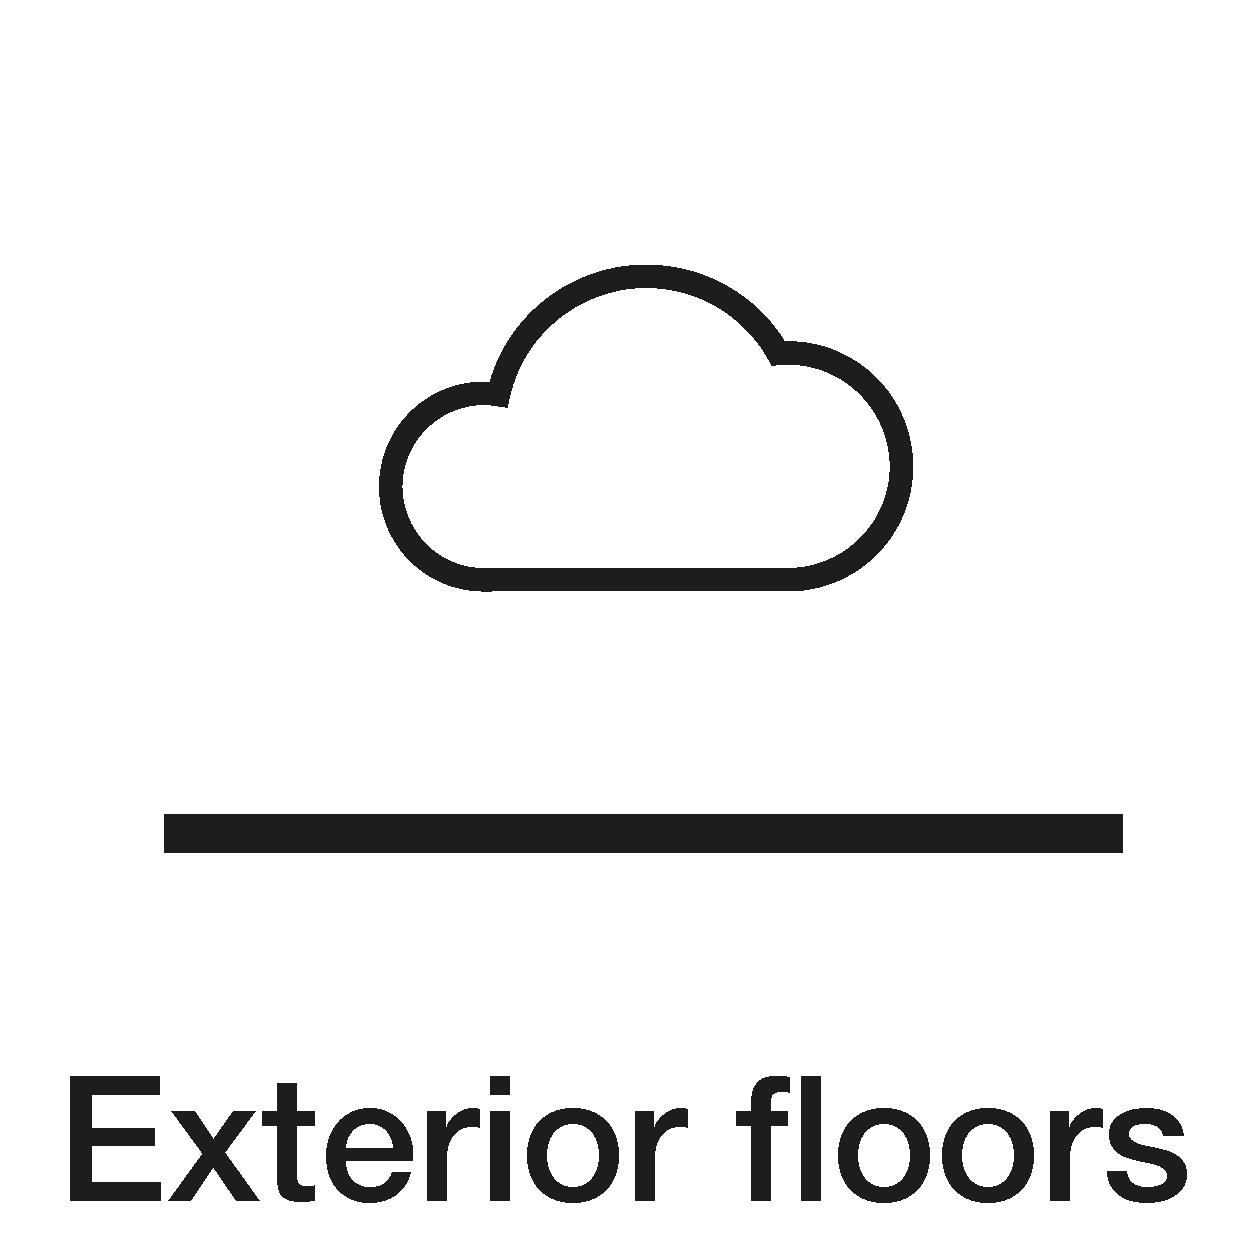 Exterior floors